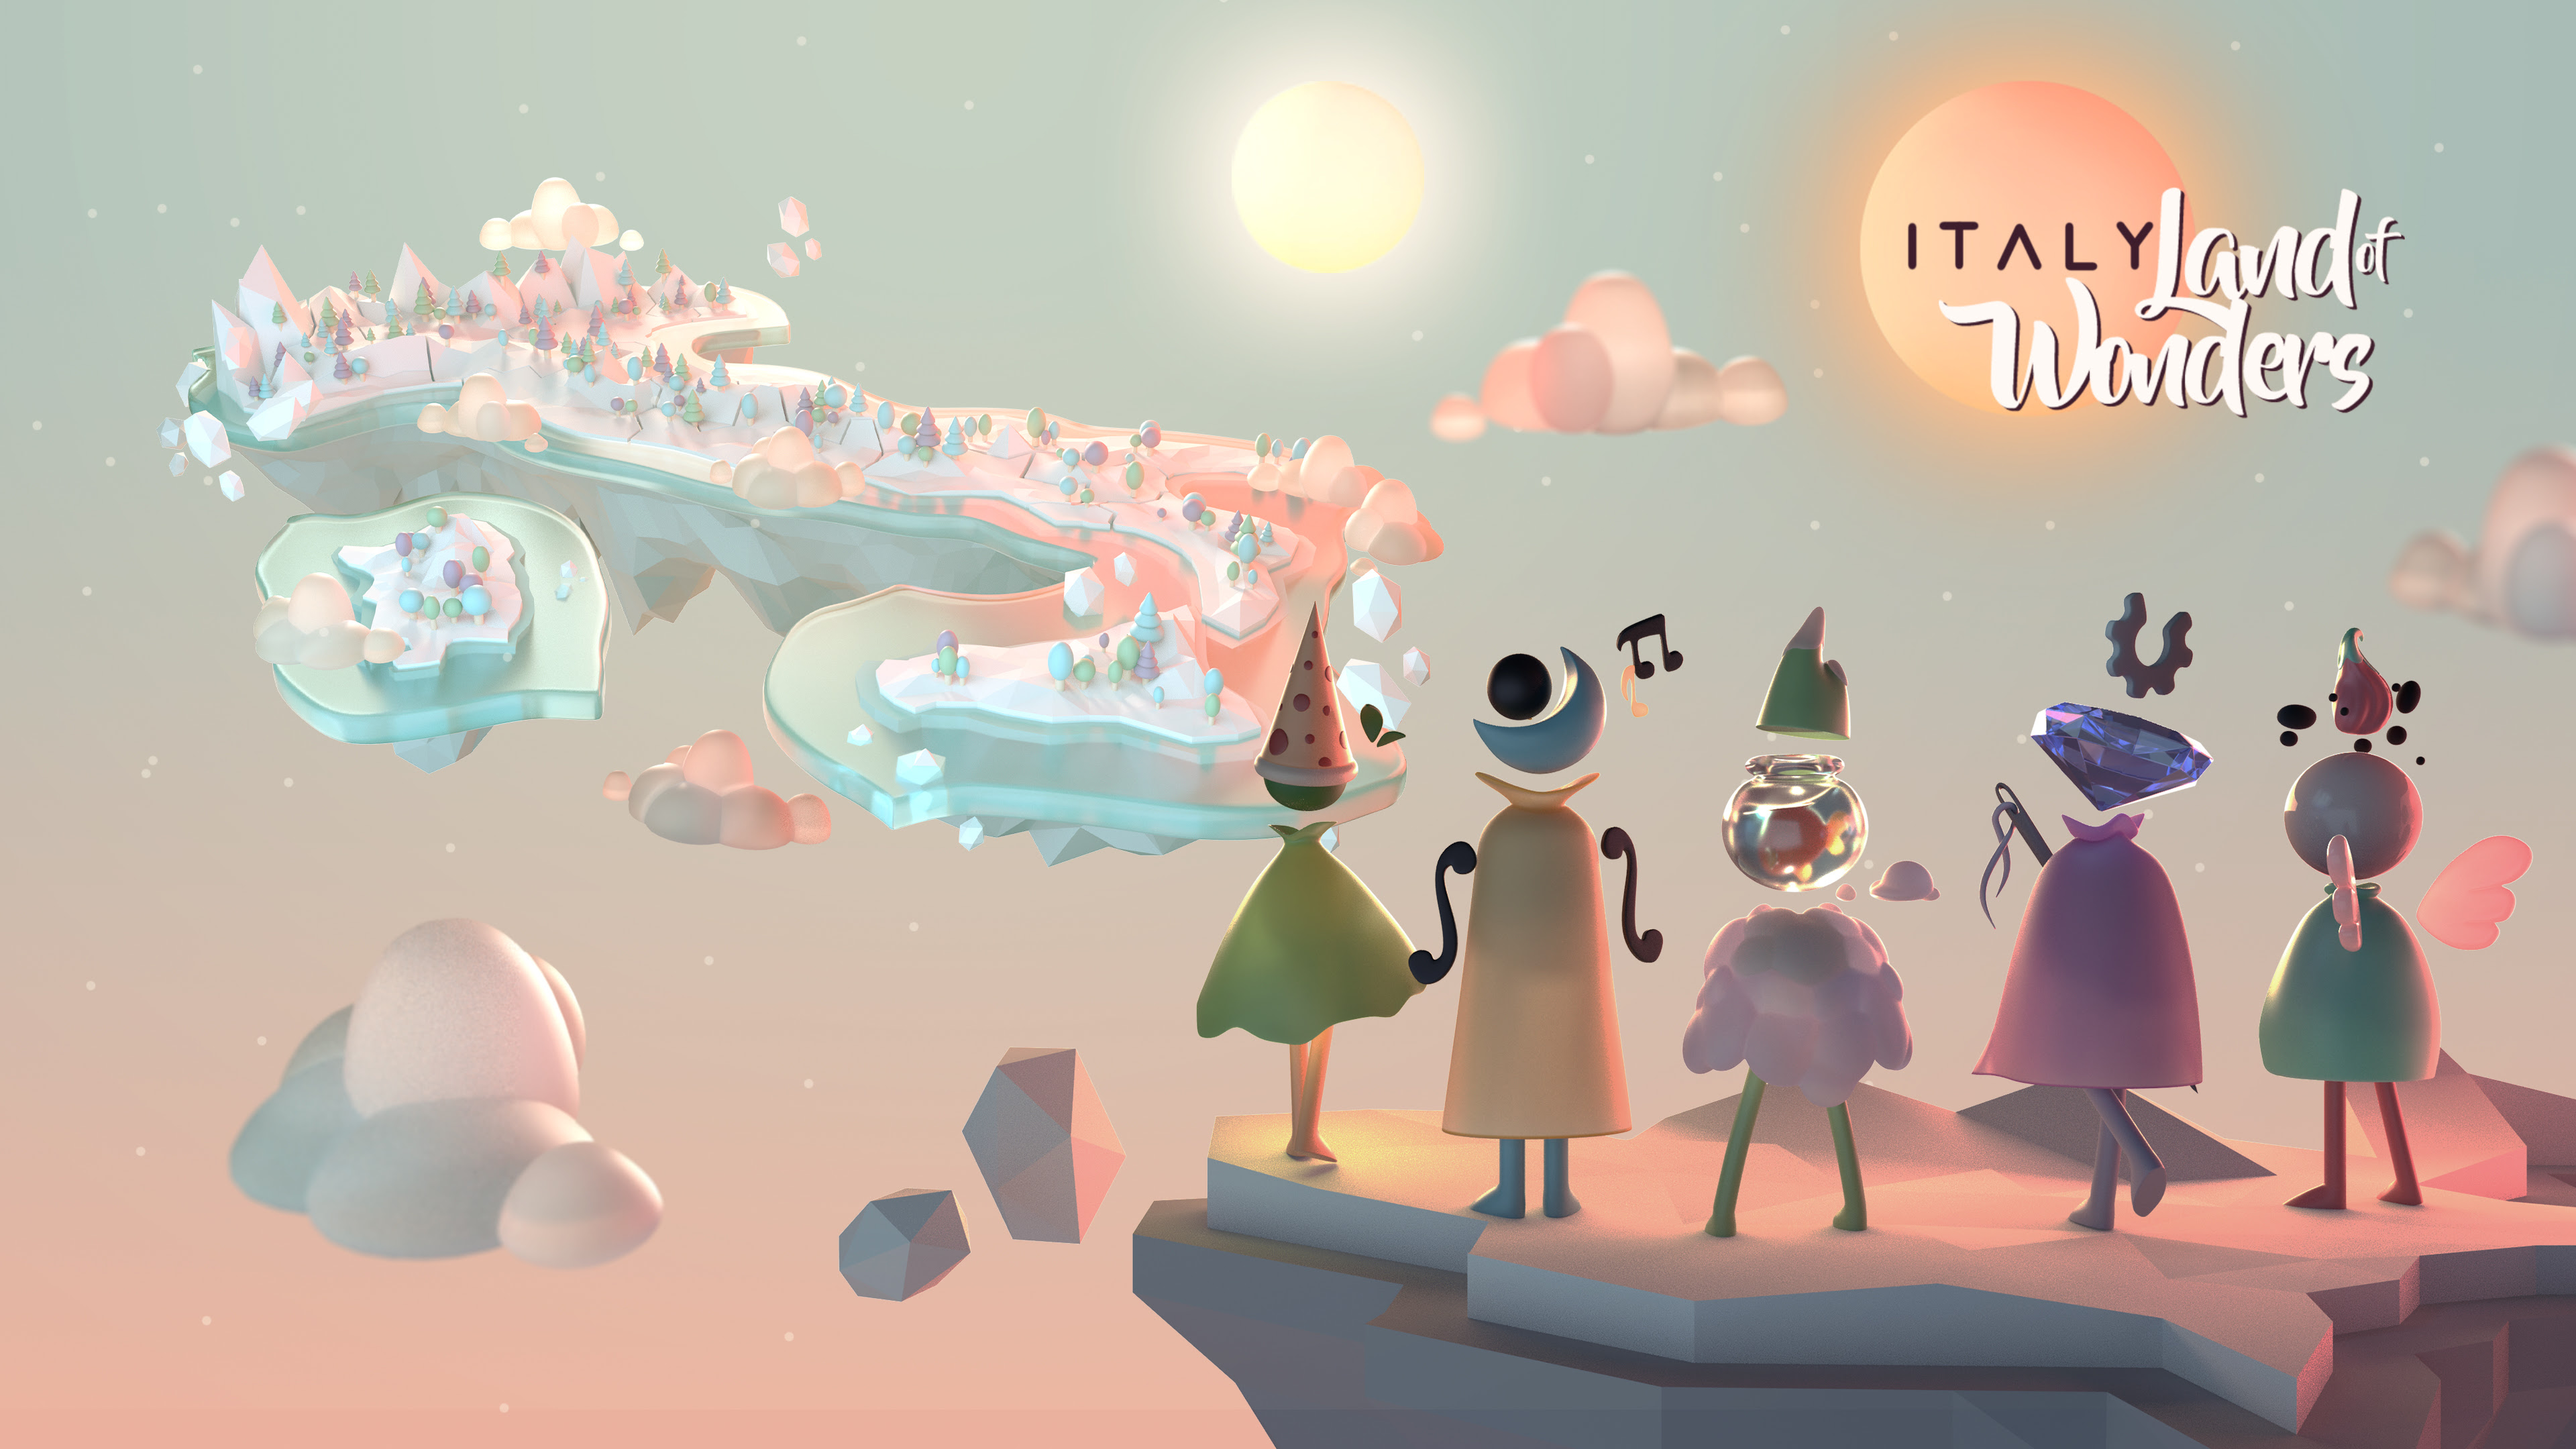 MFA | ITALY. Land of Wonders já está disponível para celulares